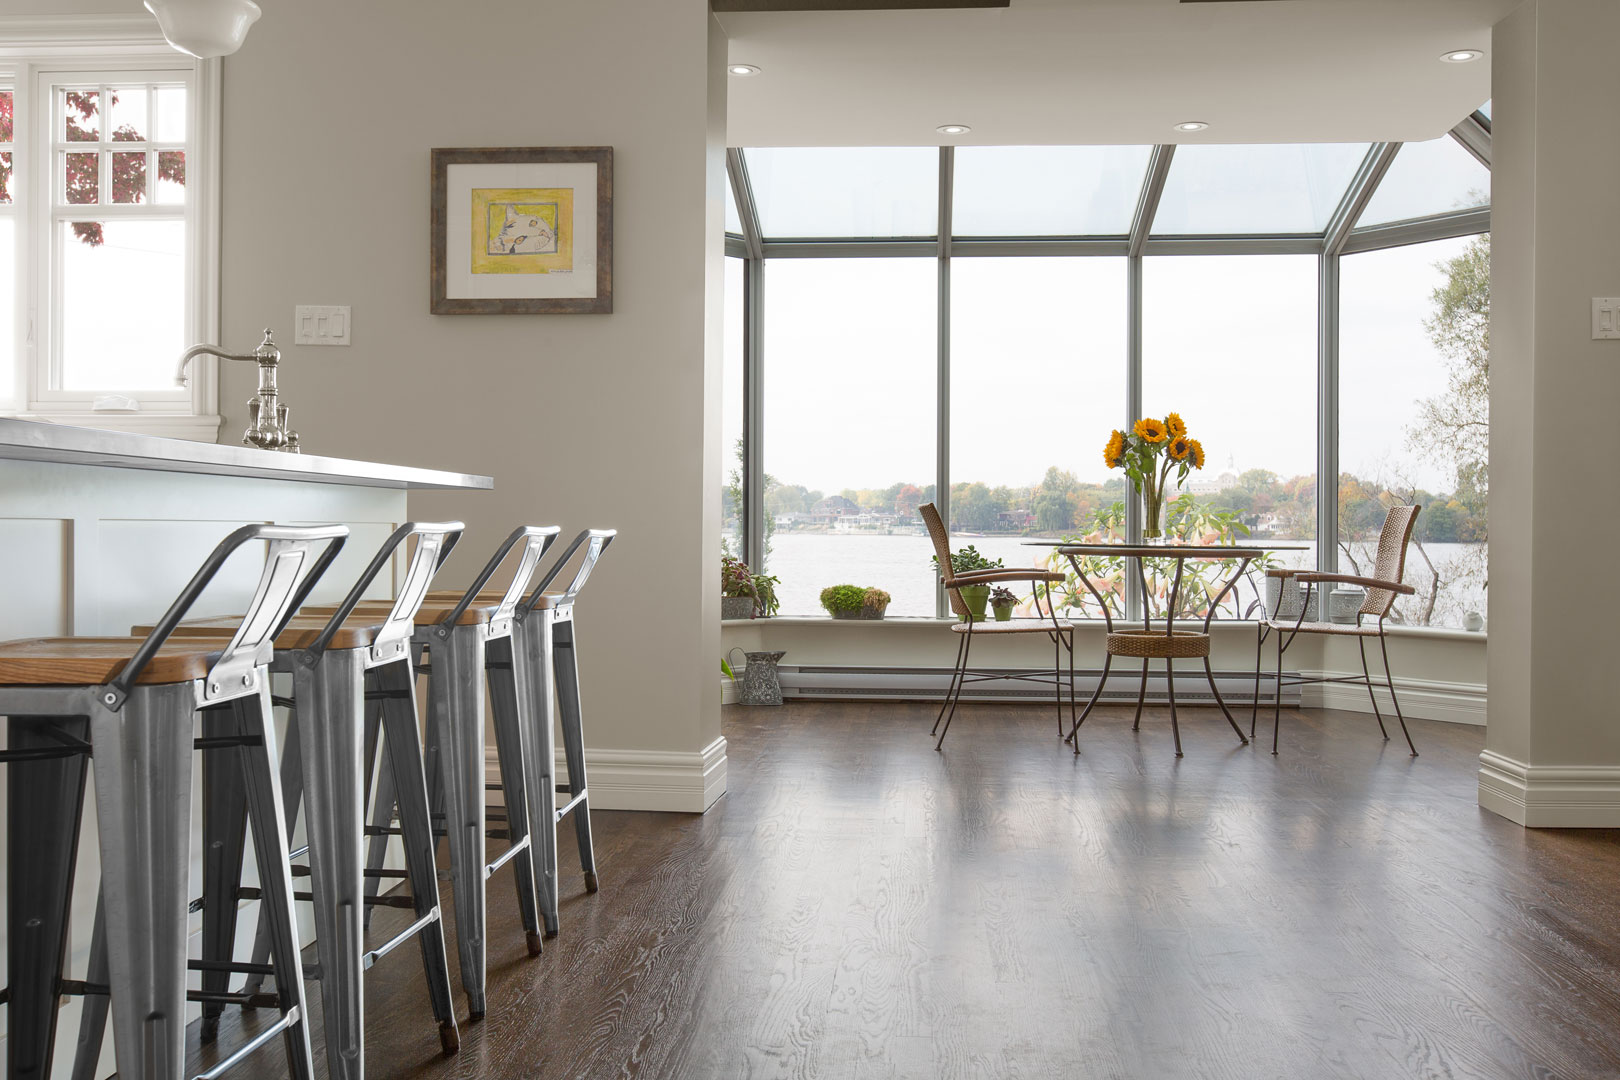 homewise-innovations-kitchen-renovations-toronto-sylvio2